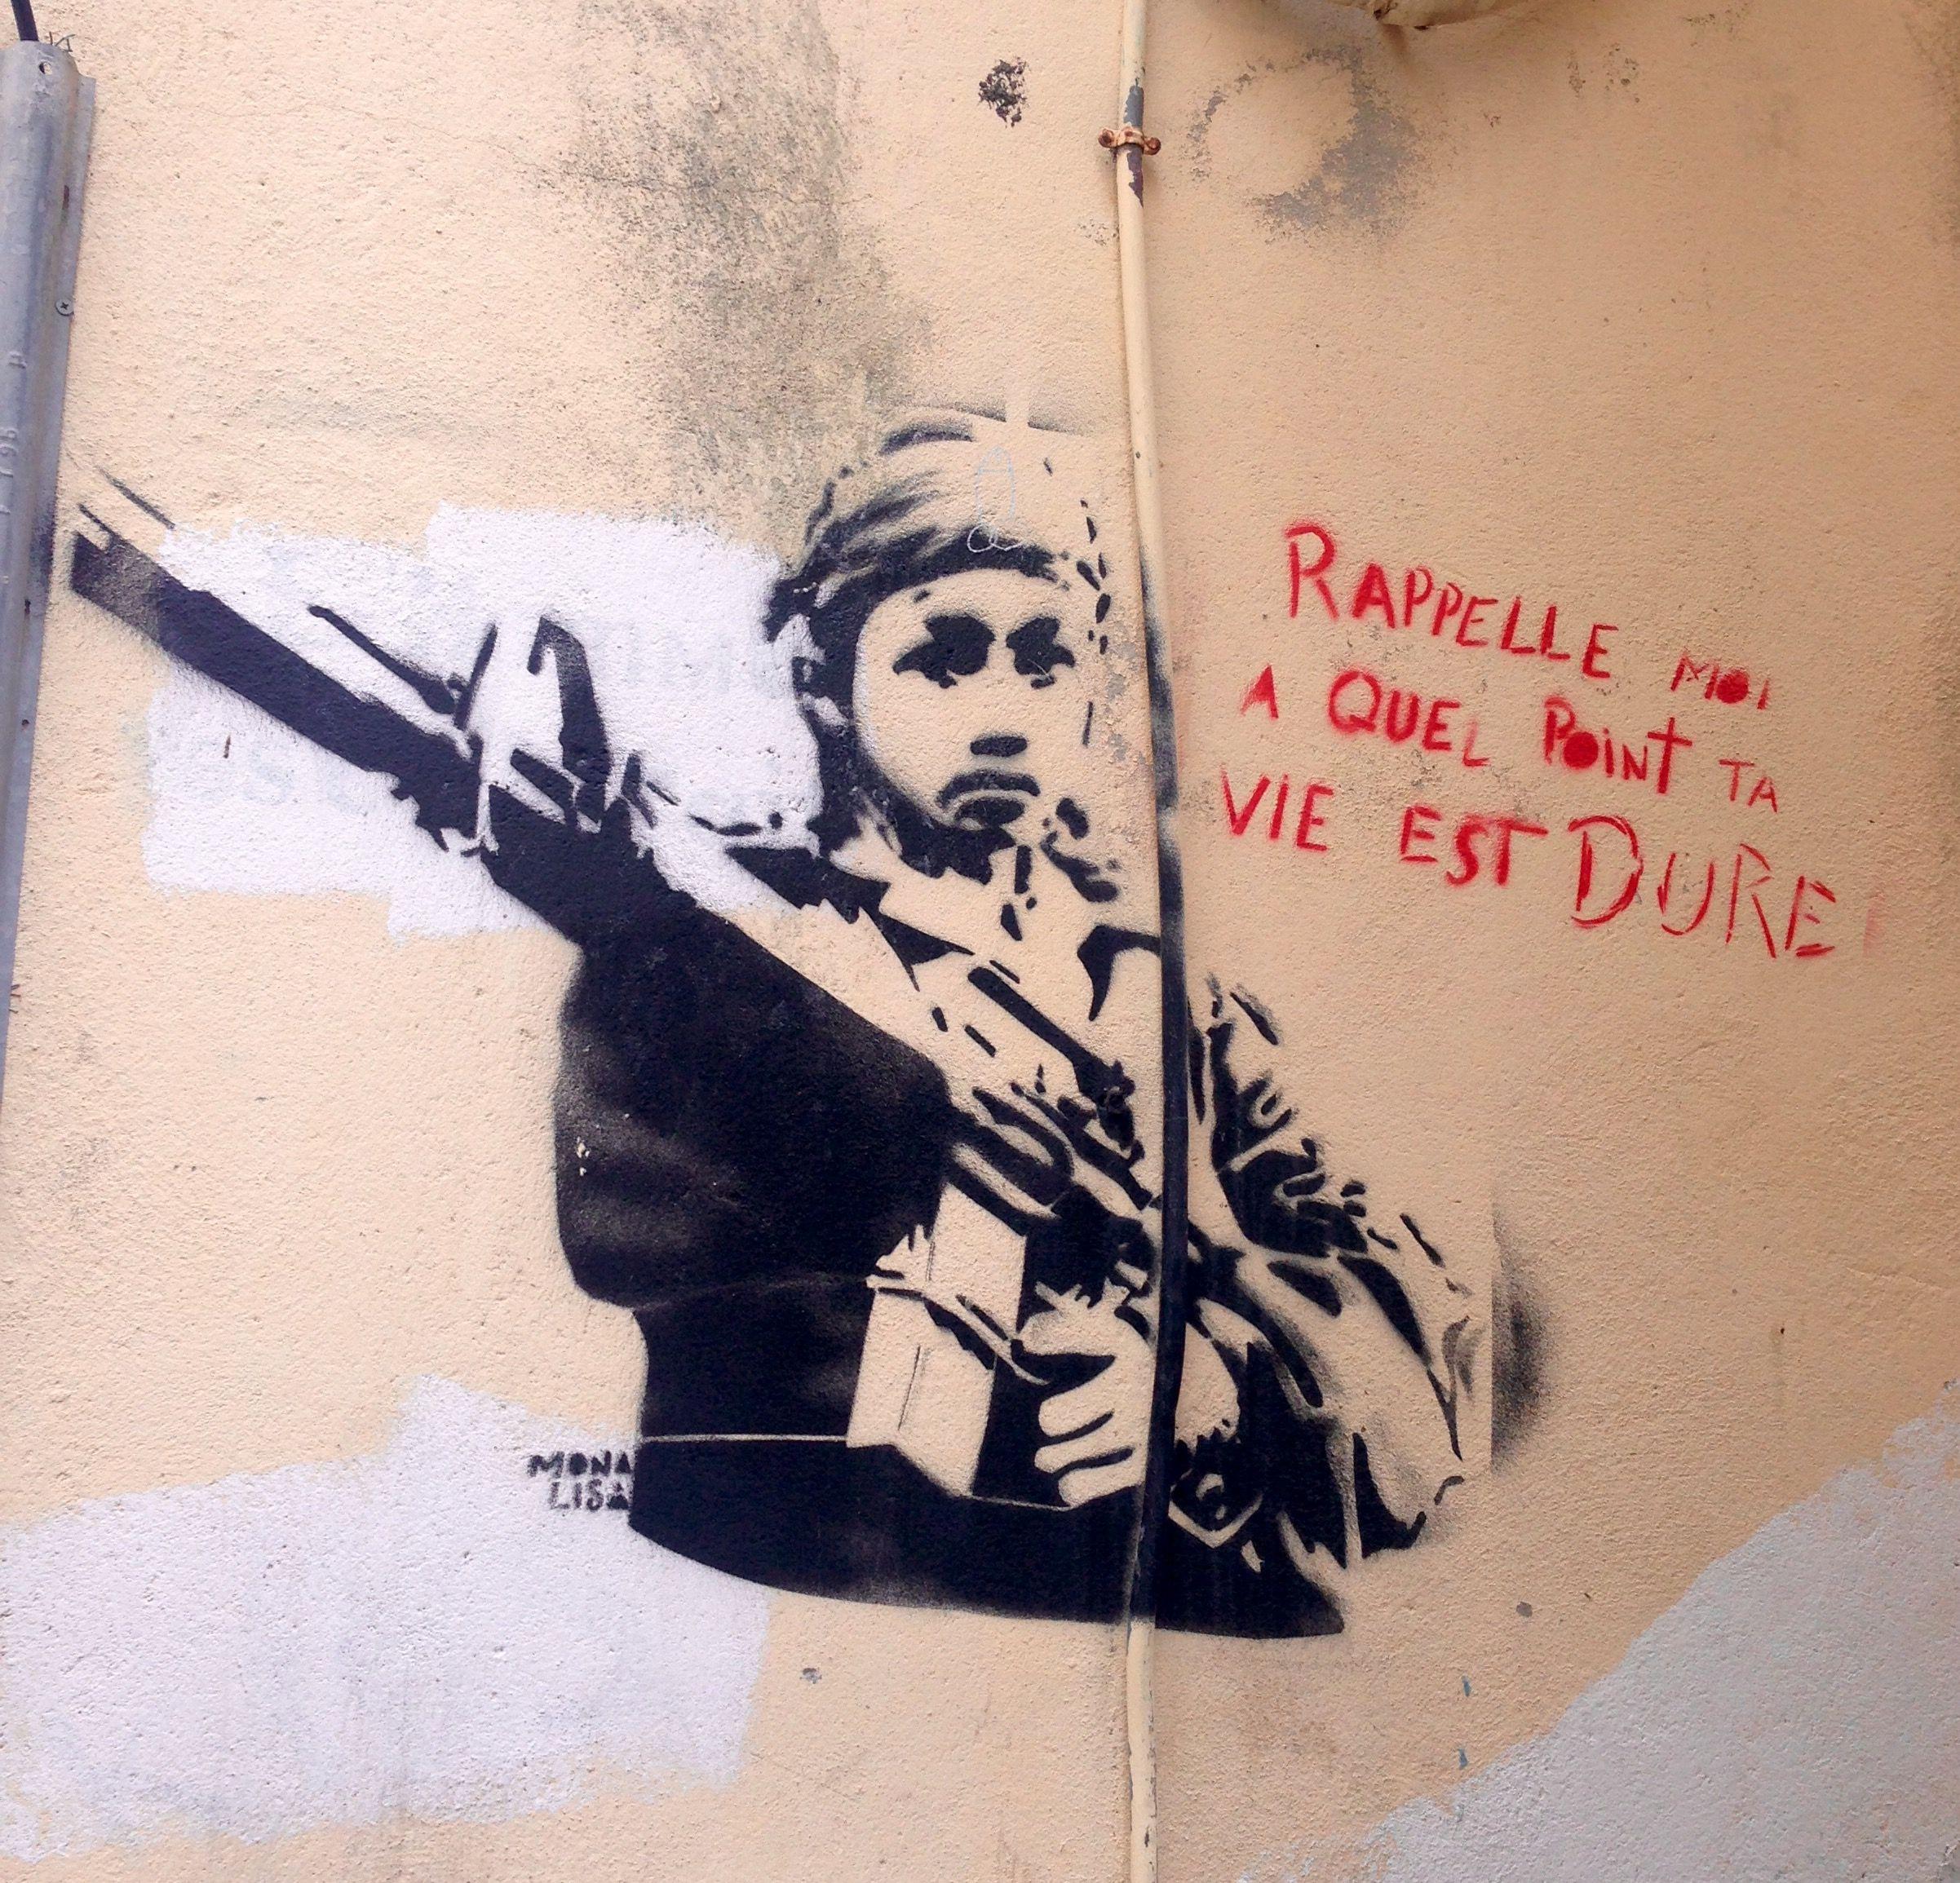 Épinglé par France Auda sur Street art Calvi, Lisa